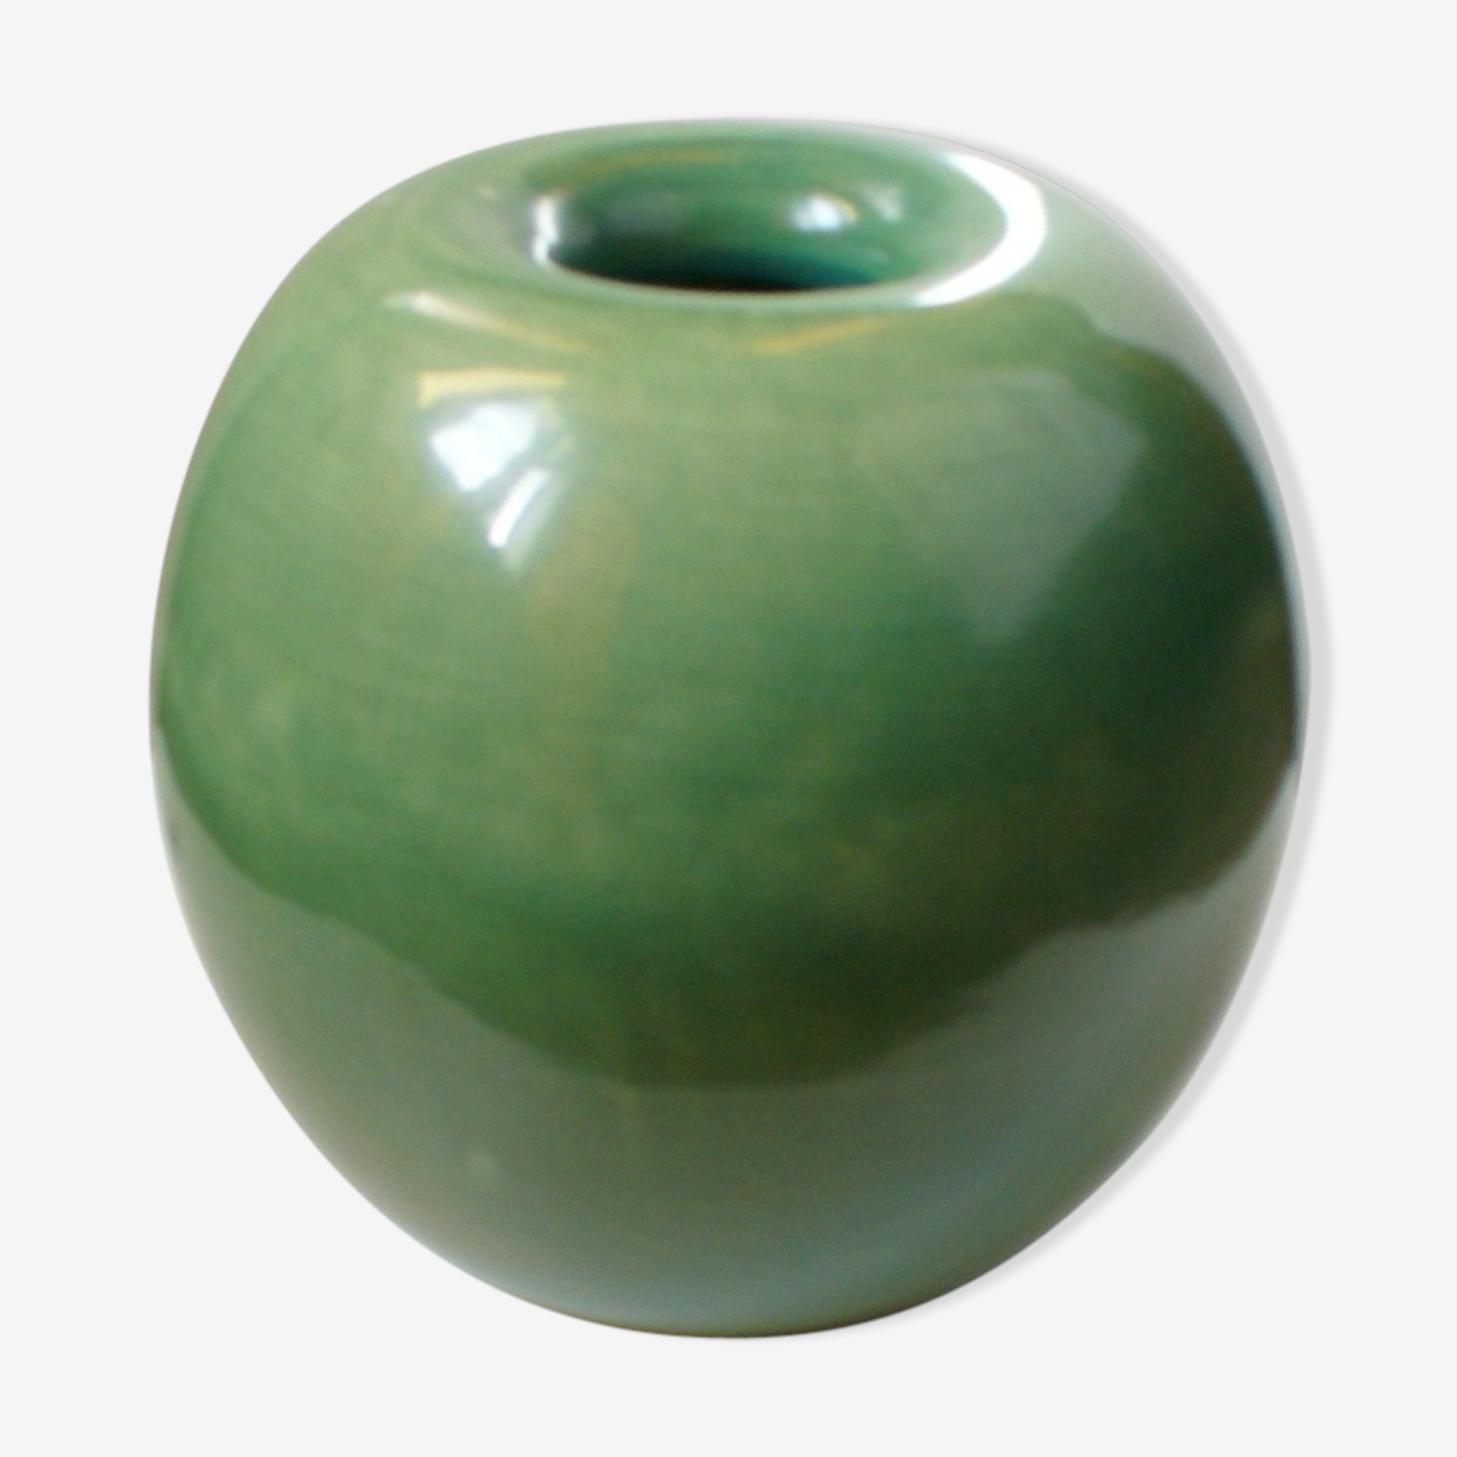 Green vase ceramic for Richard Ginori 1930 s